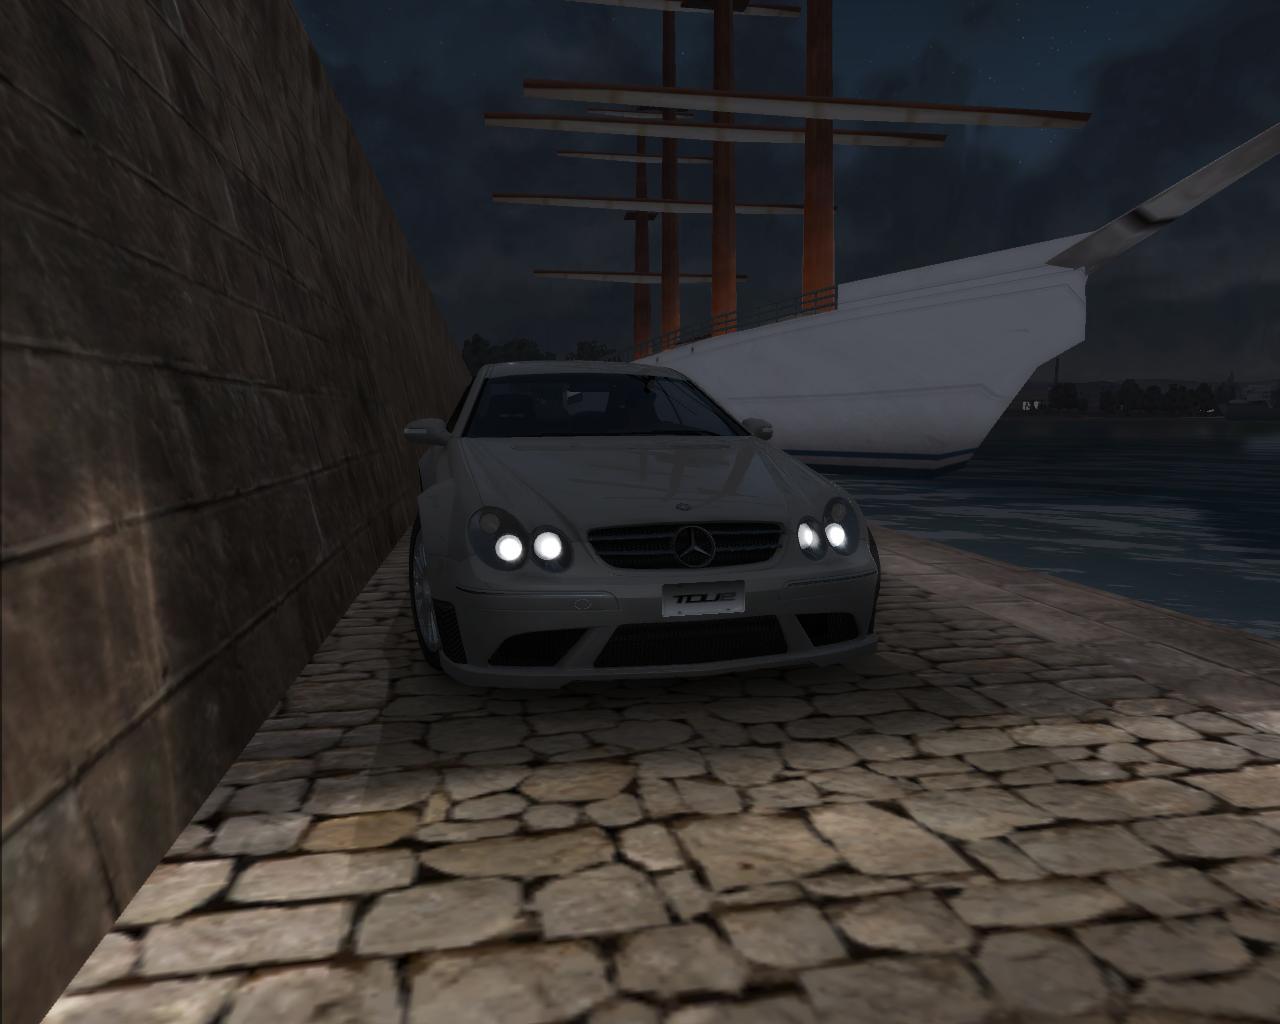 Mercedes-Benz CLK 63 AMG Black Series - Test Drive Unlimited 2 Mercedes-Benz CLK 63 AMG Black Series